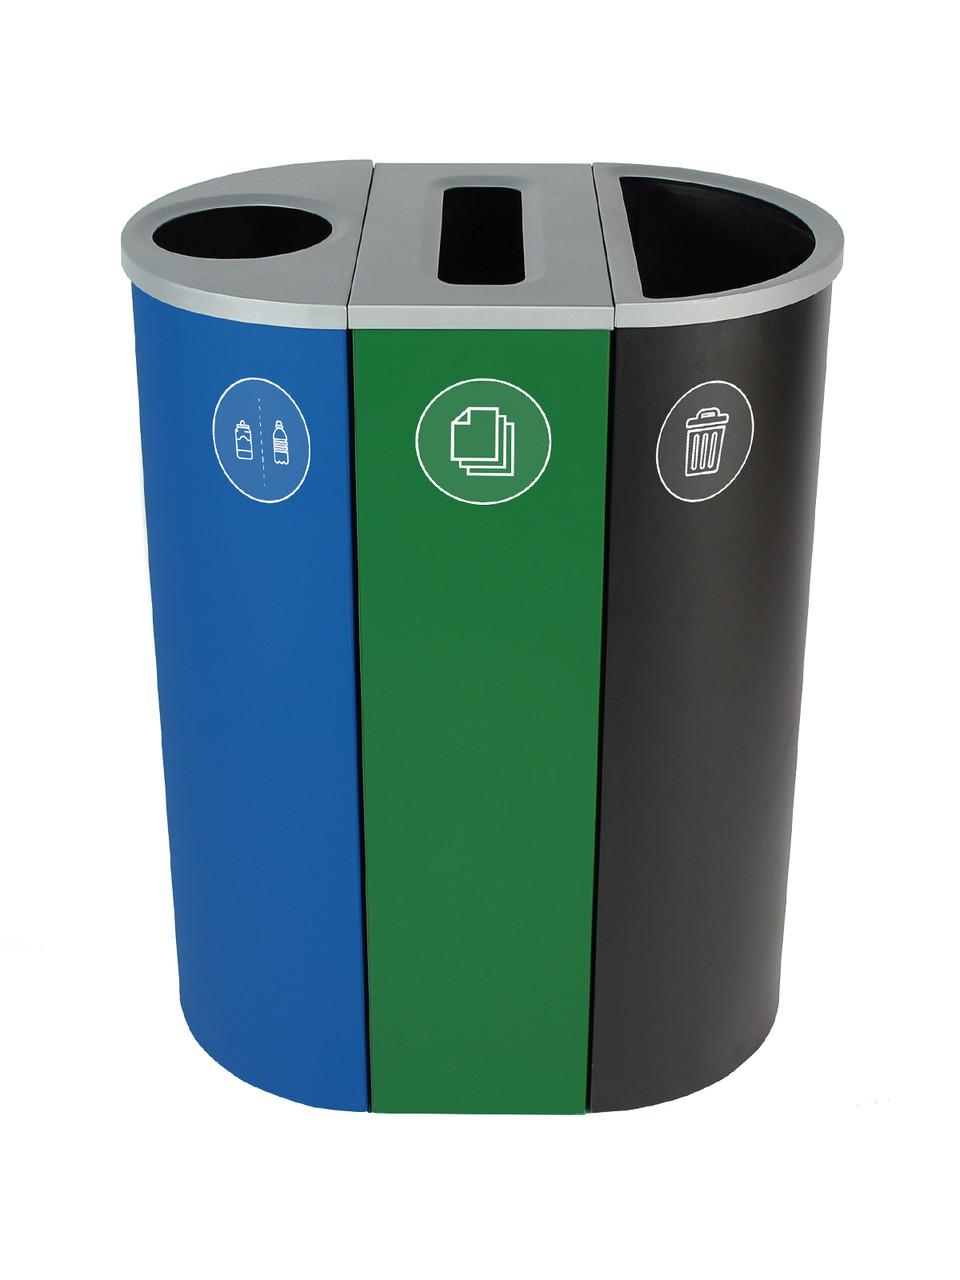 26 Gallon Spectrum Triple Recycling Station Blue/Green/Black 8107108-134